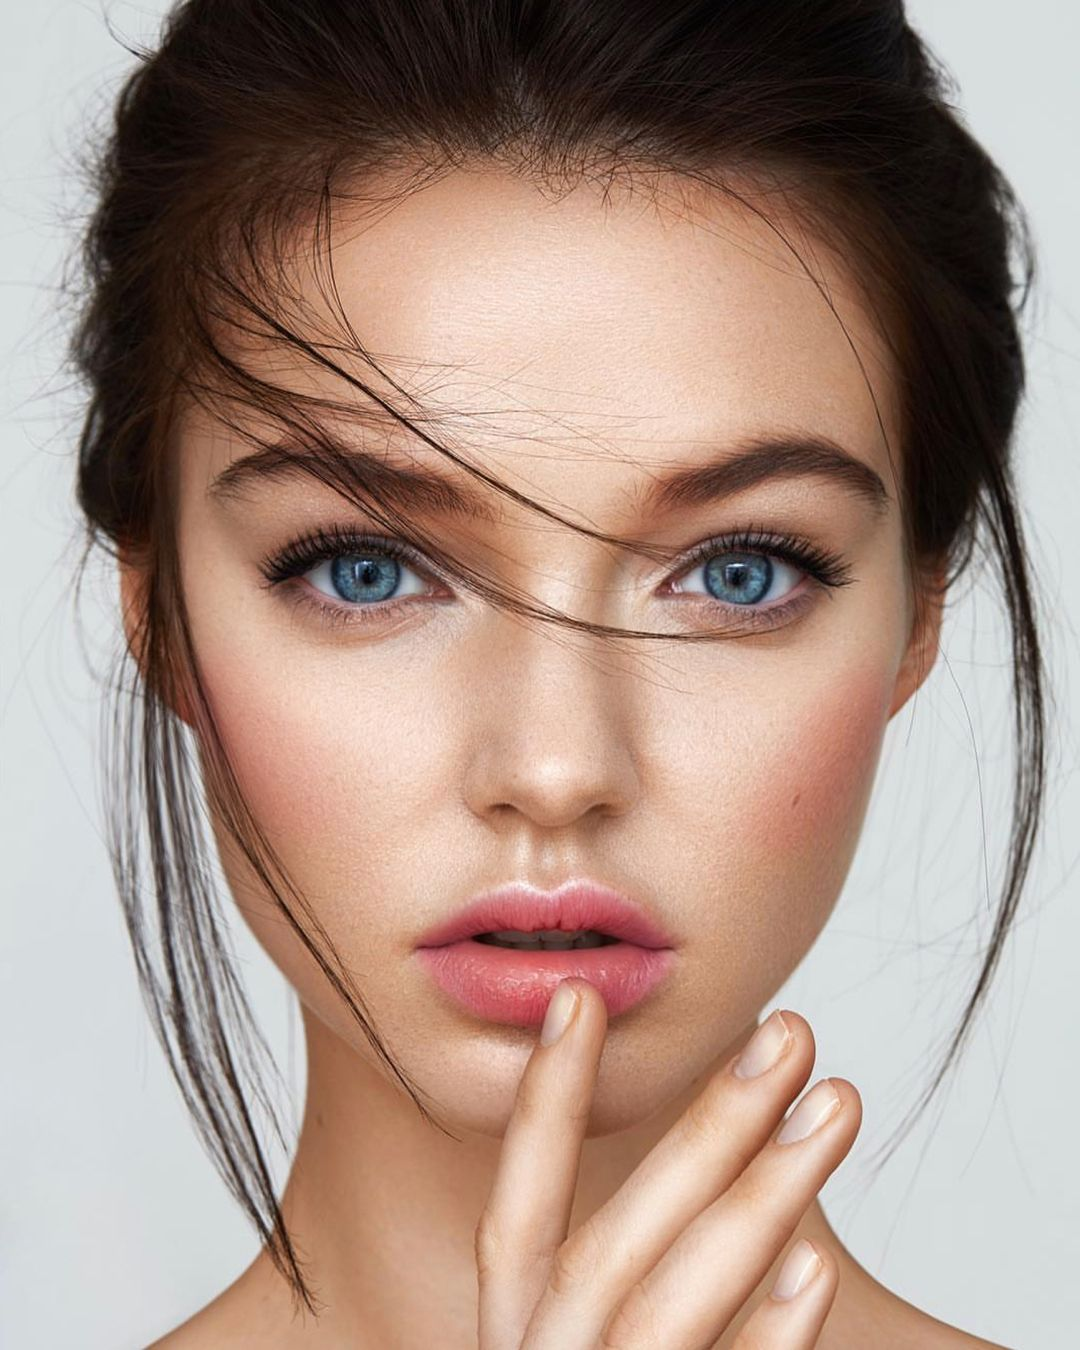 стрижка модели макияжа картинки будет жизнь